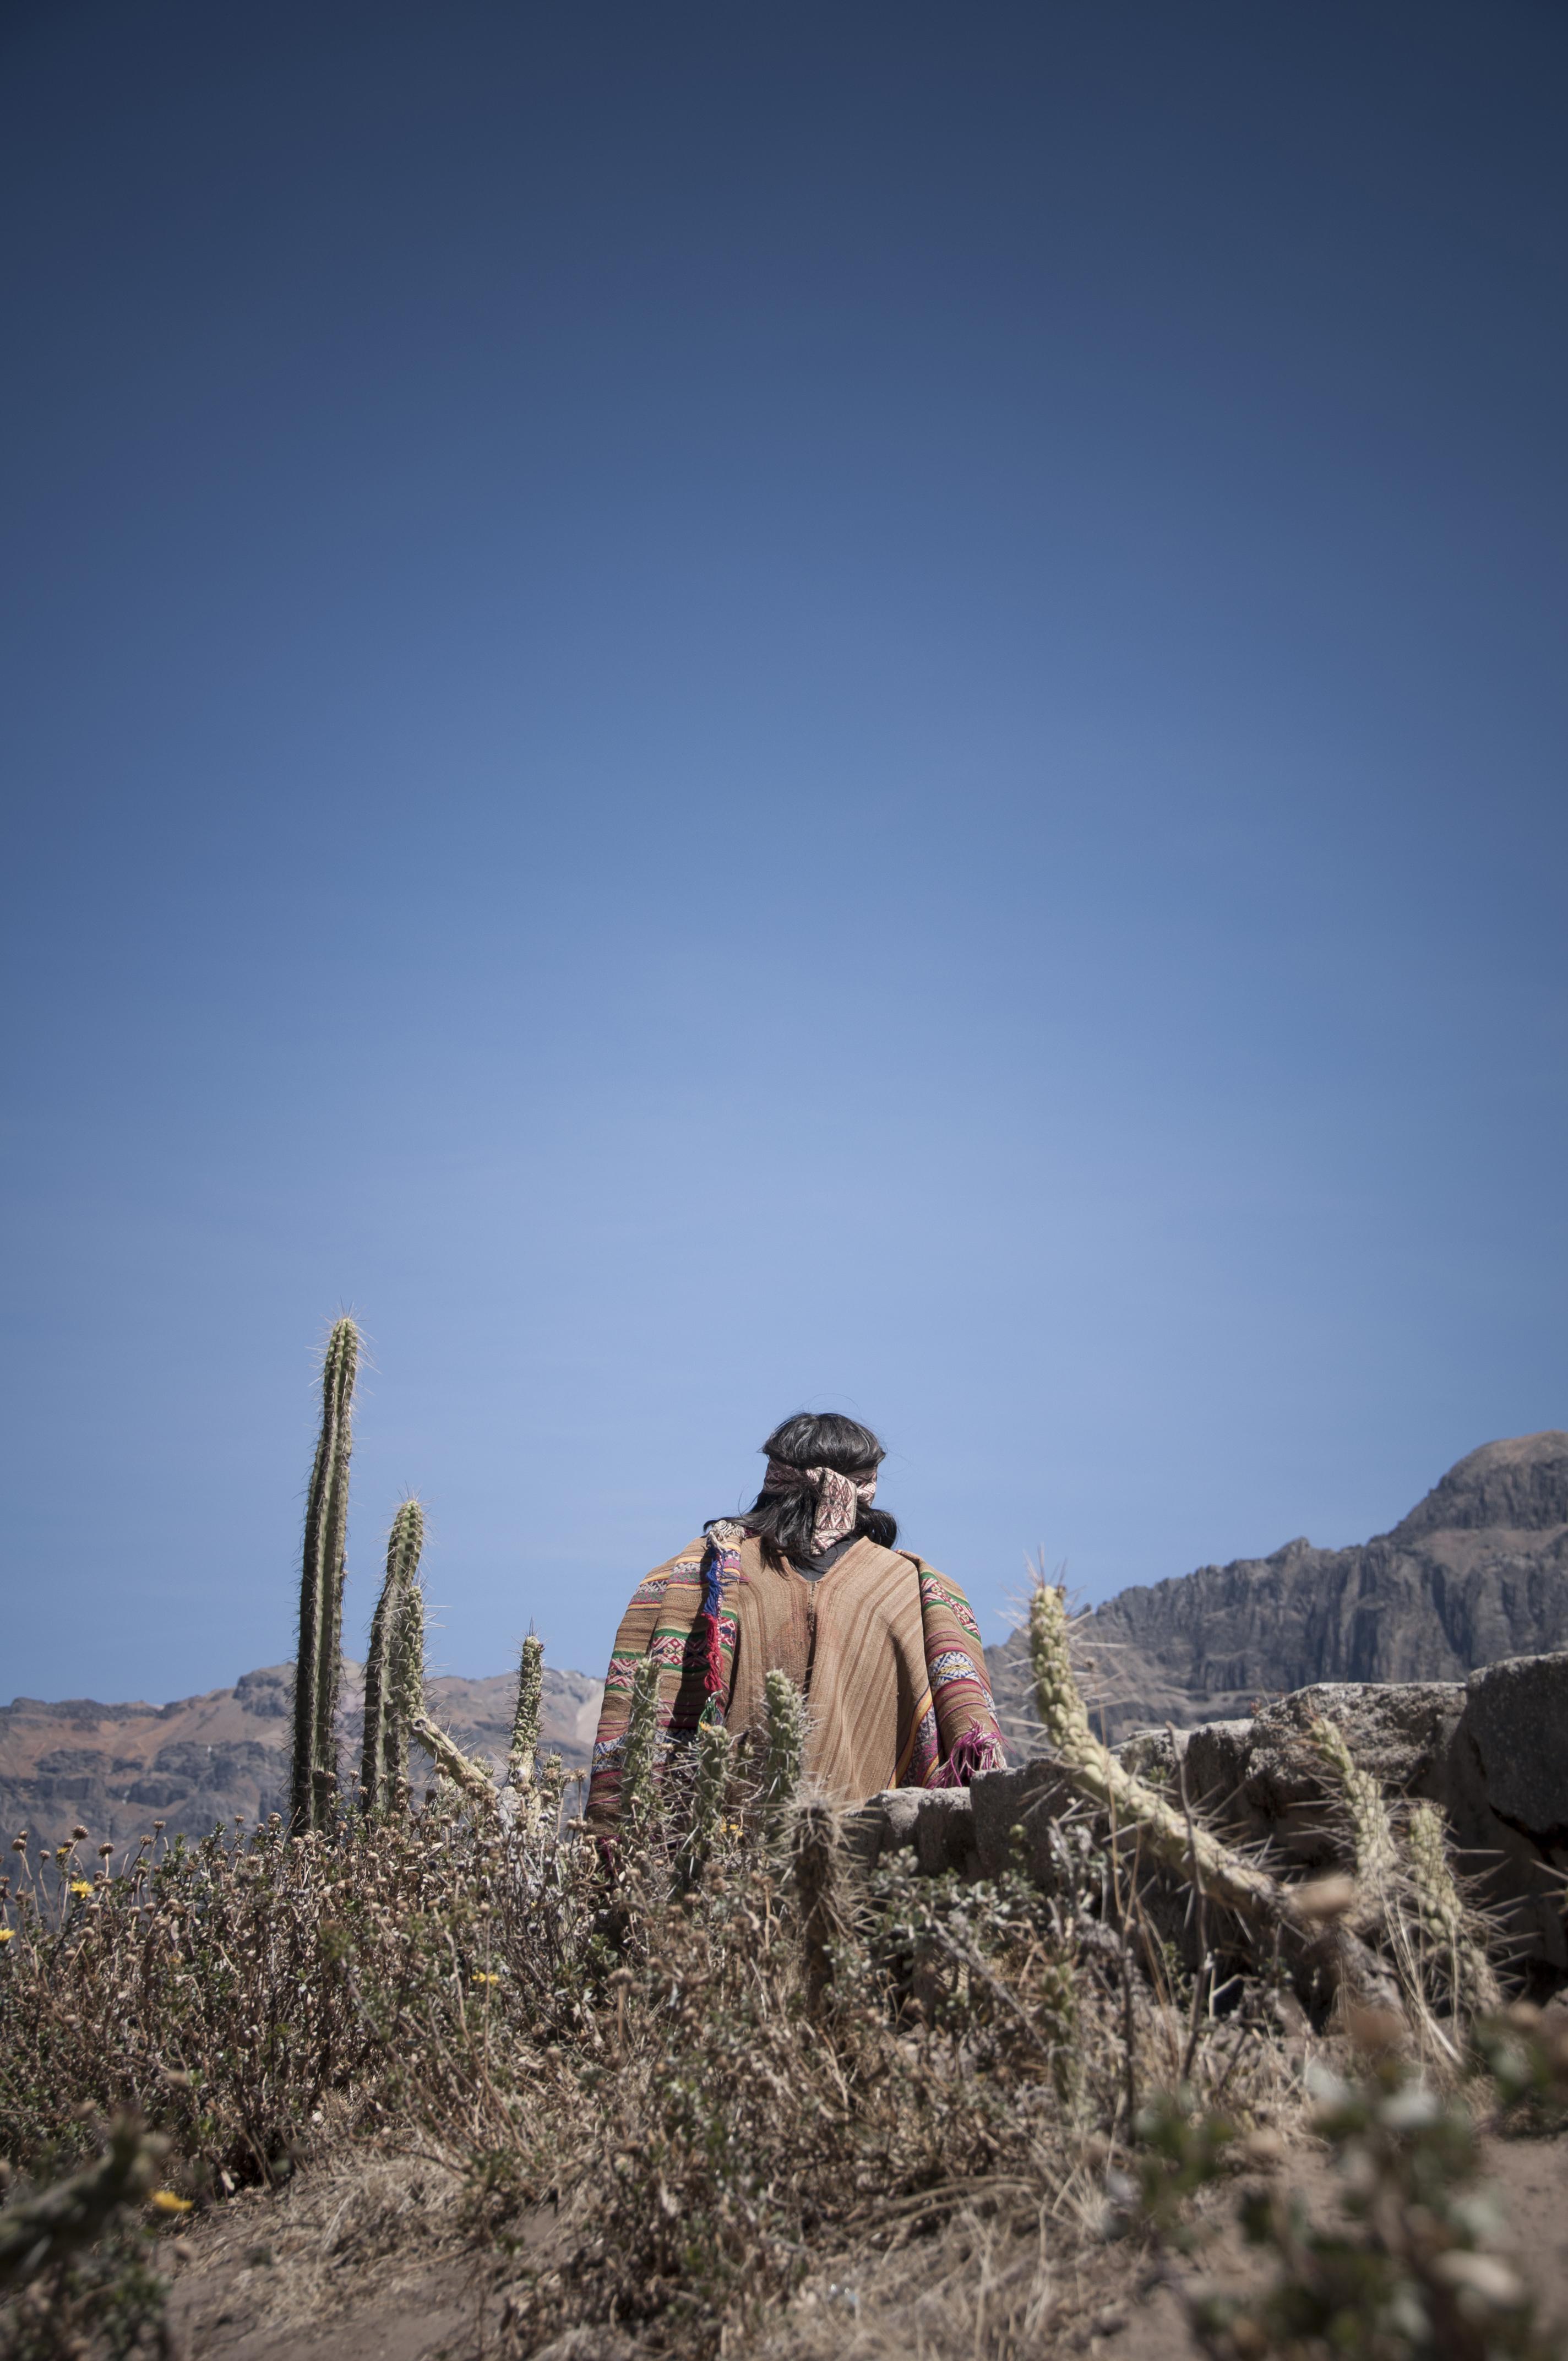 Peru 2013 Cañon del Colca Mirador del condor5